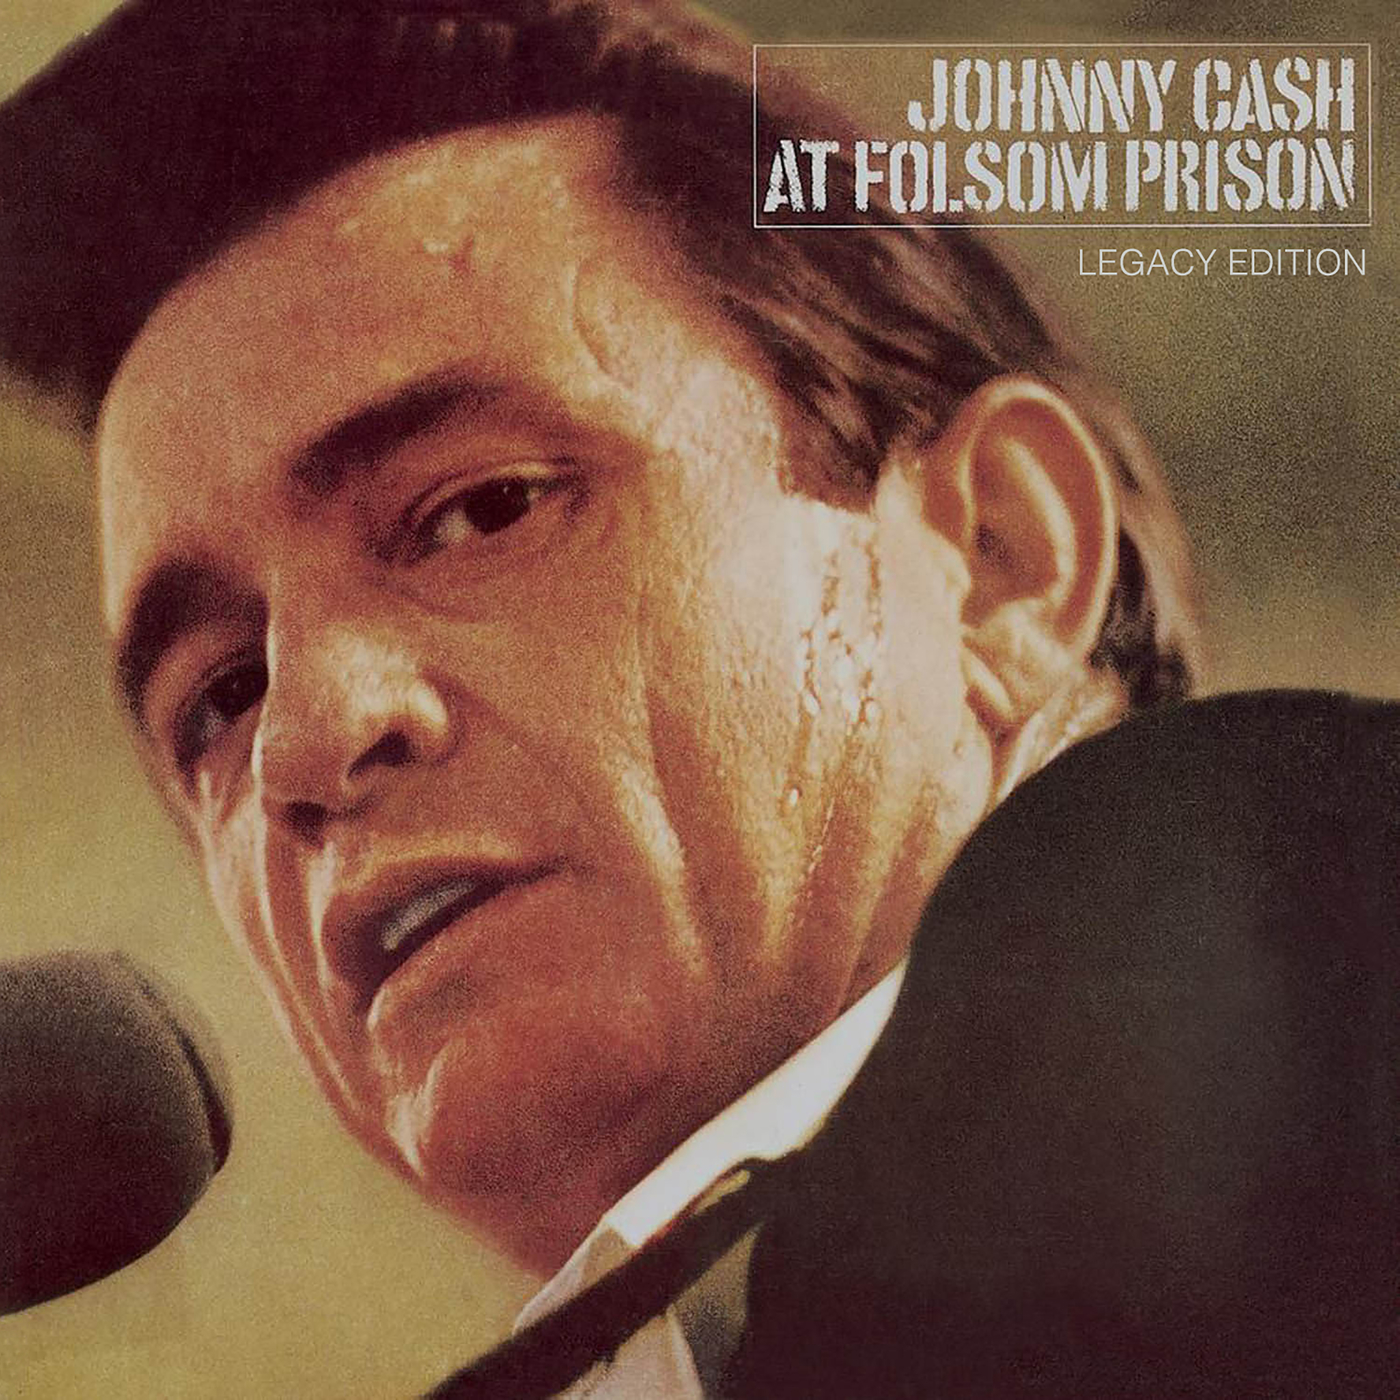 At Folsom Prison (Legacy Edition) - Johnny Cash